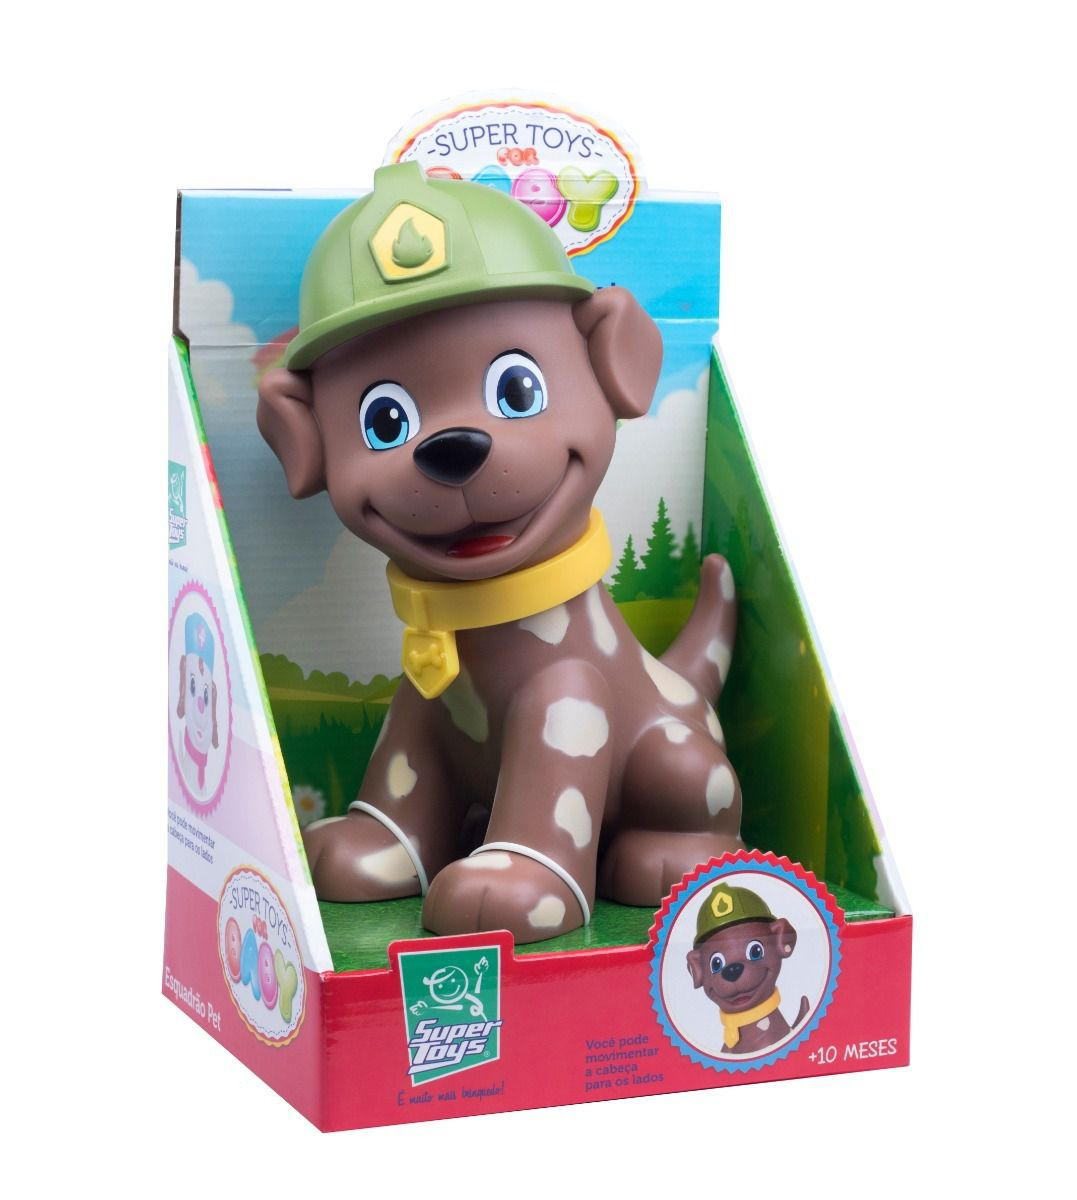 SUPER TOYS FOR BABY ESQUADRAO PET - Super Toys